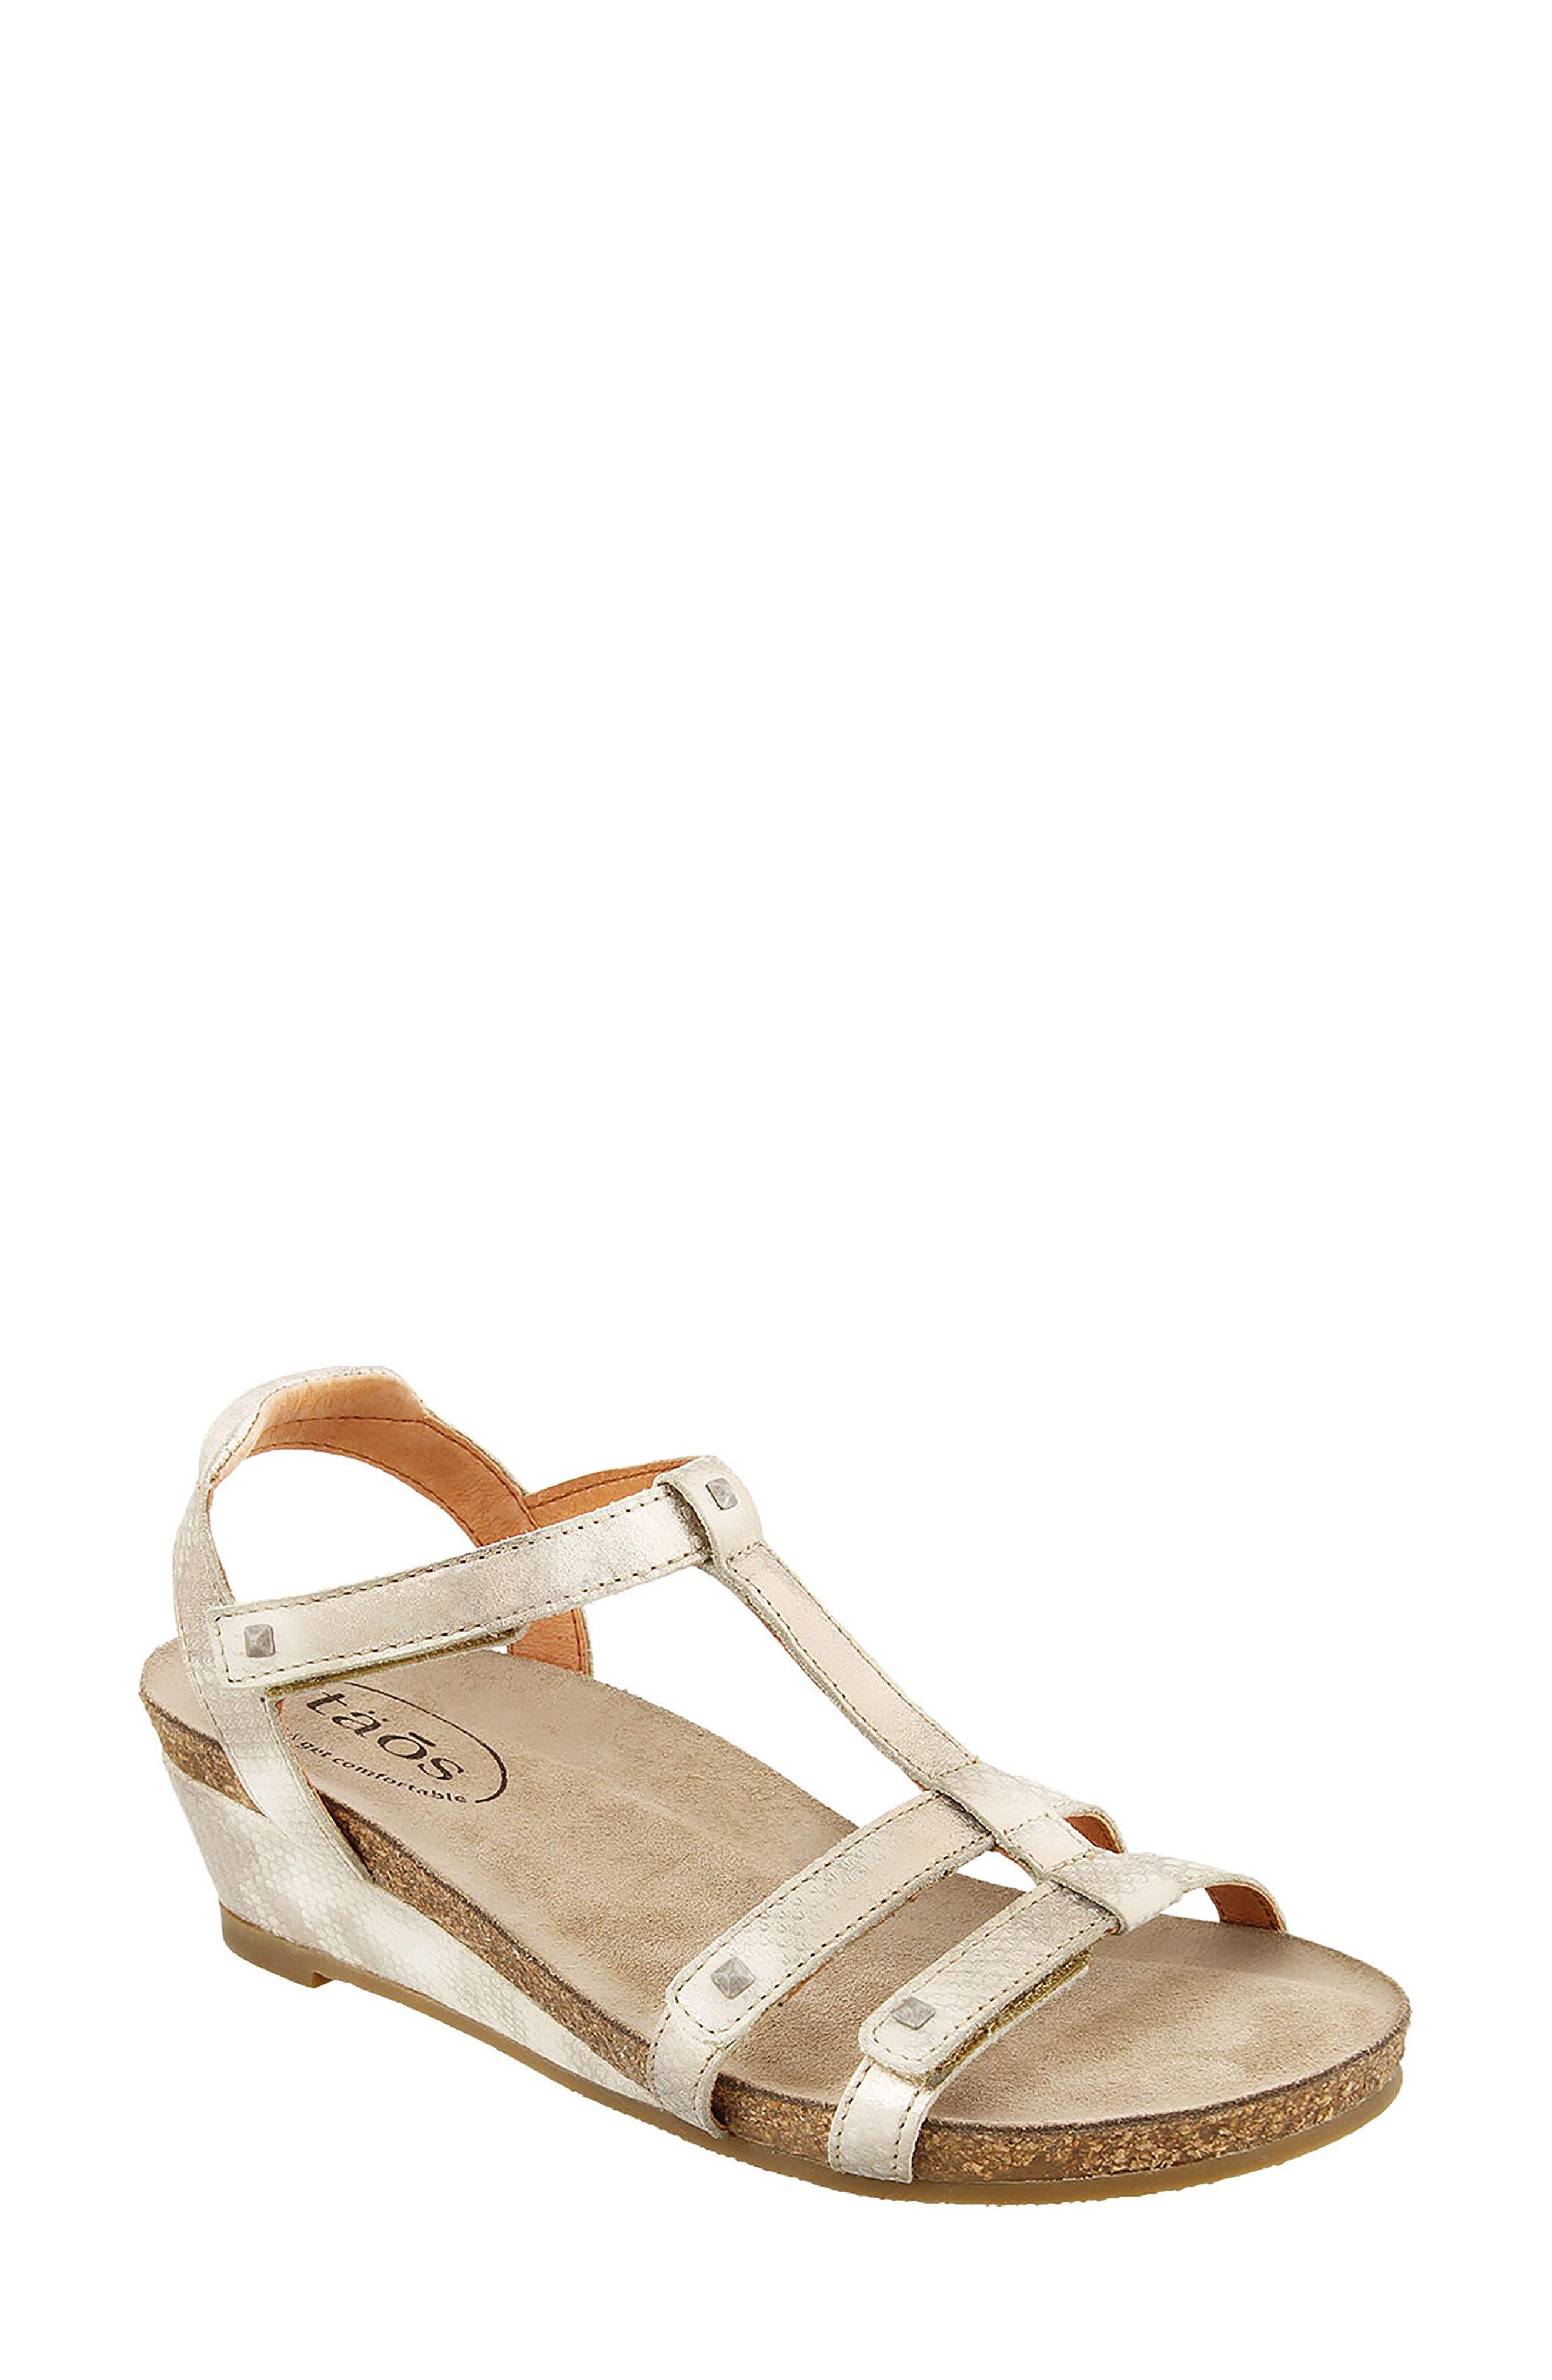 Wanderer Sandal,                         Main,                         color, Silver Leather